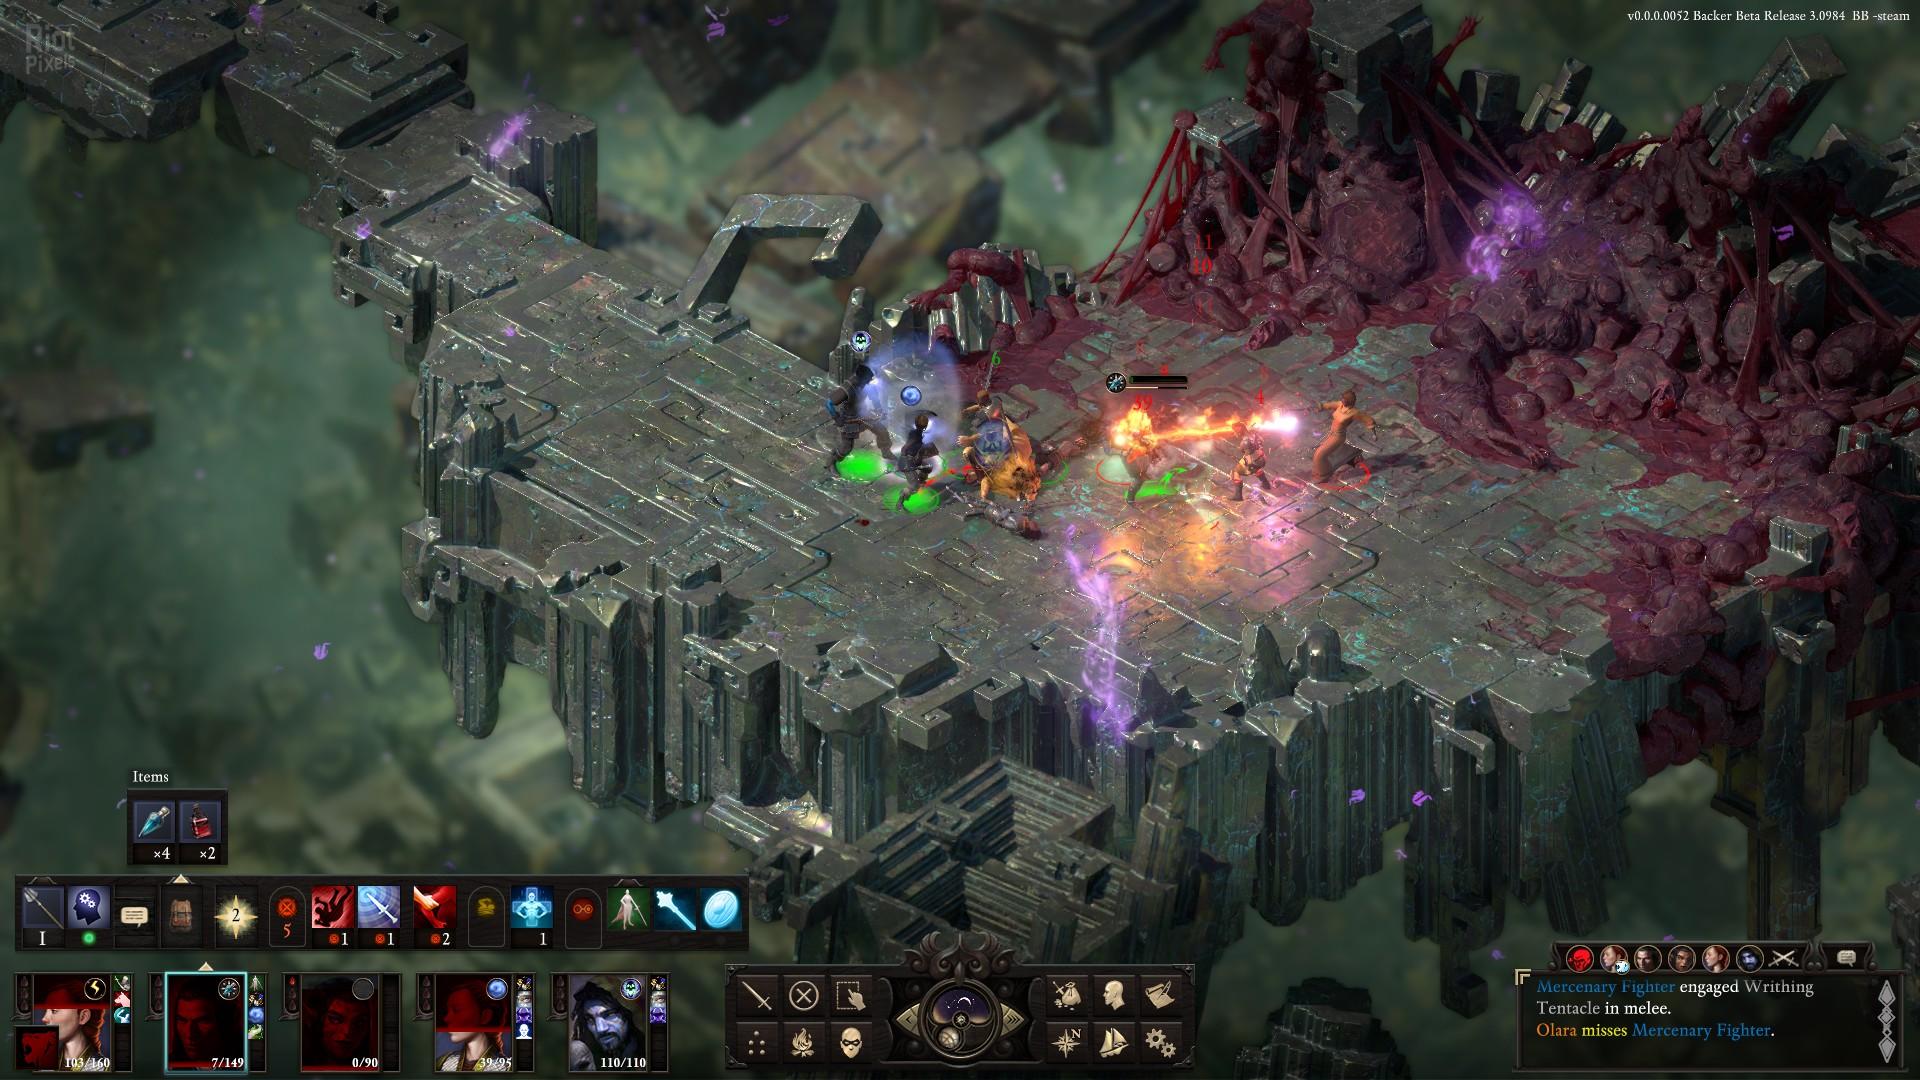 Pillars of Eternity 2: Deadfire - game screenshots at Riot